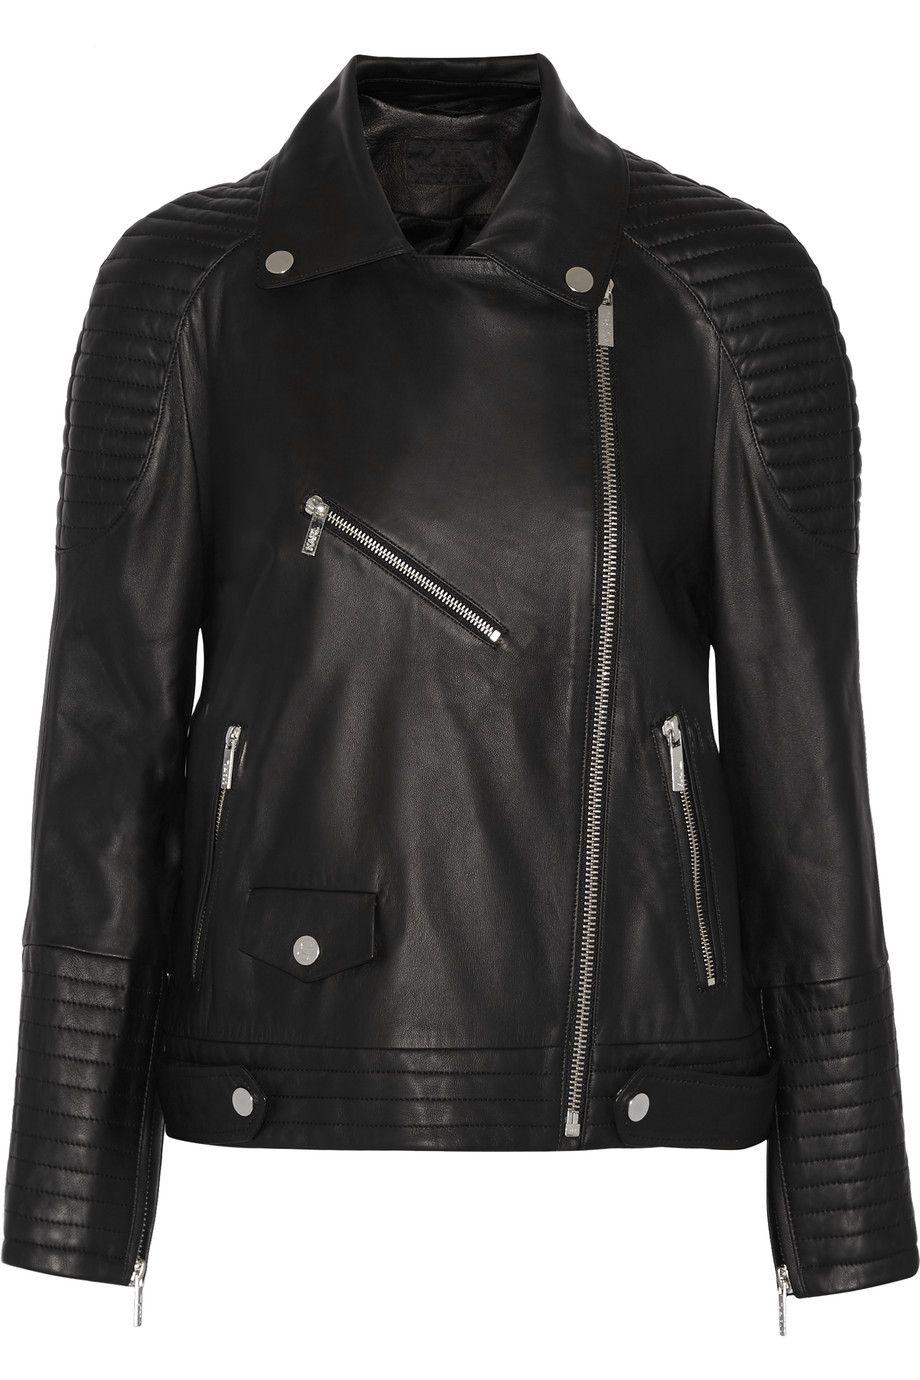 KARL LAGERFELD Renate Leather Biker Jacket karllagerfeld cloth